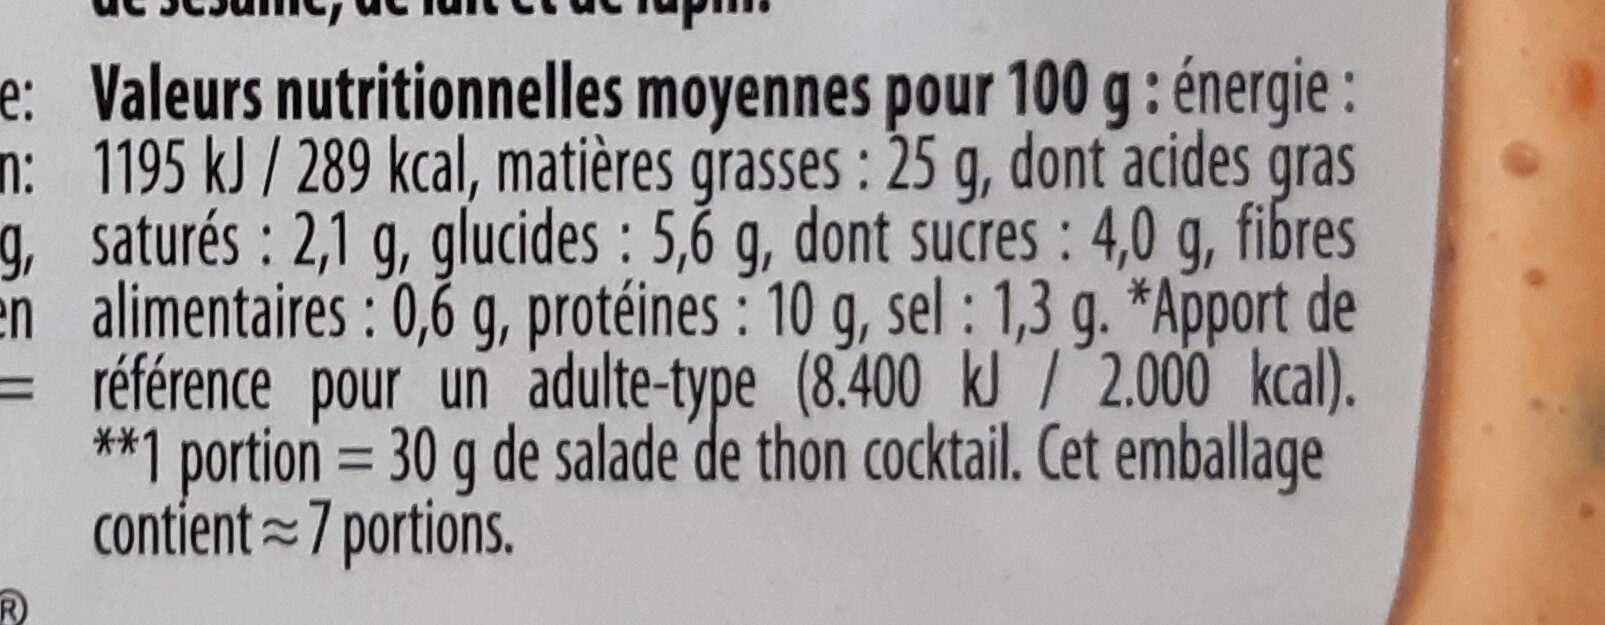 Thon cocktail - Informations nutritionnelles - fr